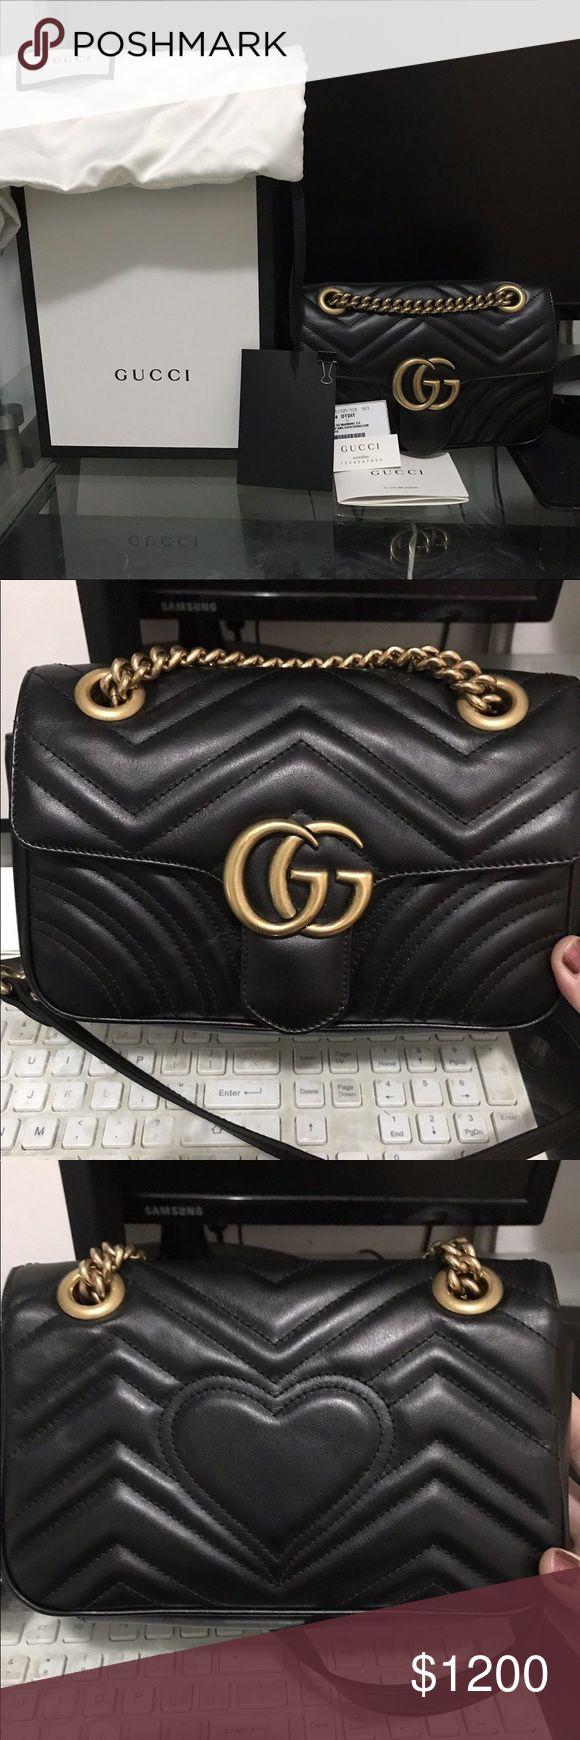 Gucci Pyrmont